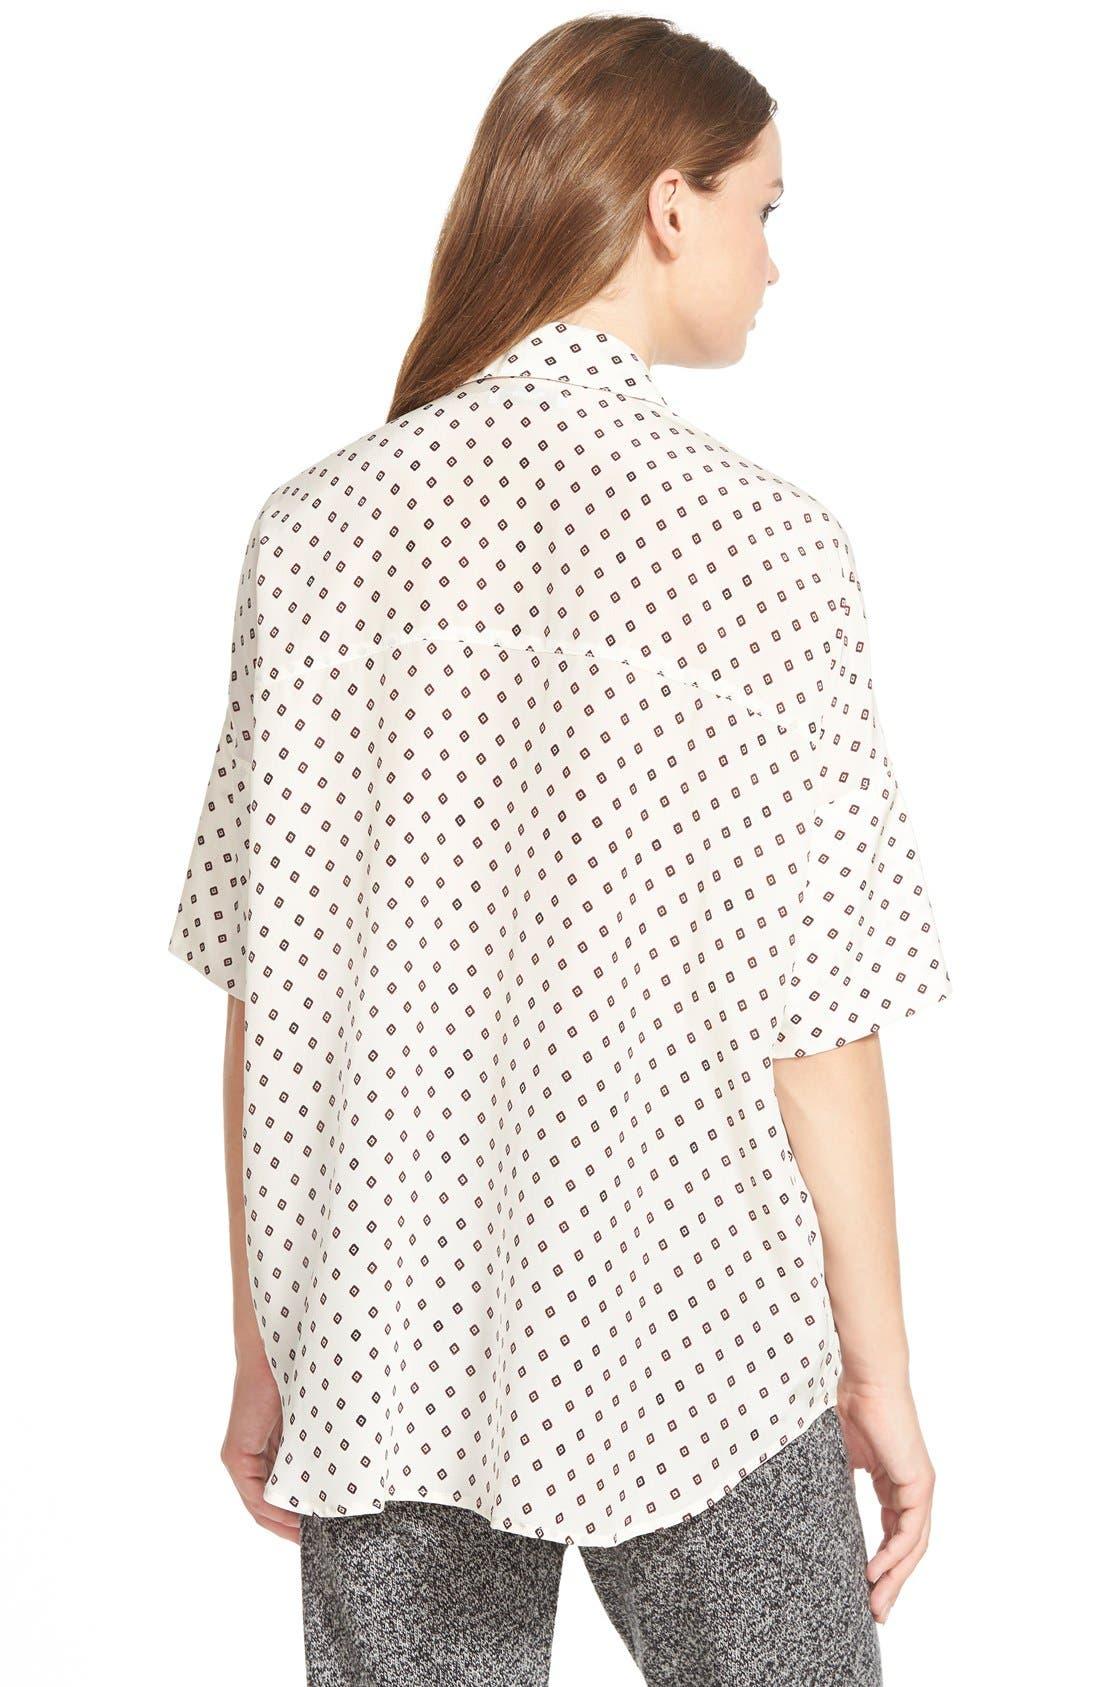 MADEWELL,                             'Foulard Dot' Silk Courier Shirt,                             Alternate thumbnail 5, color,                             900